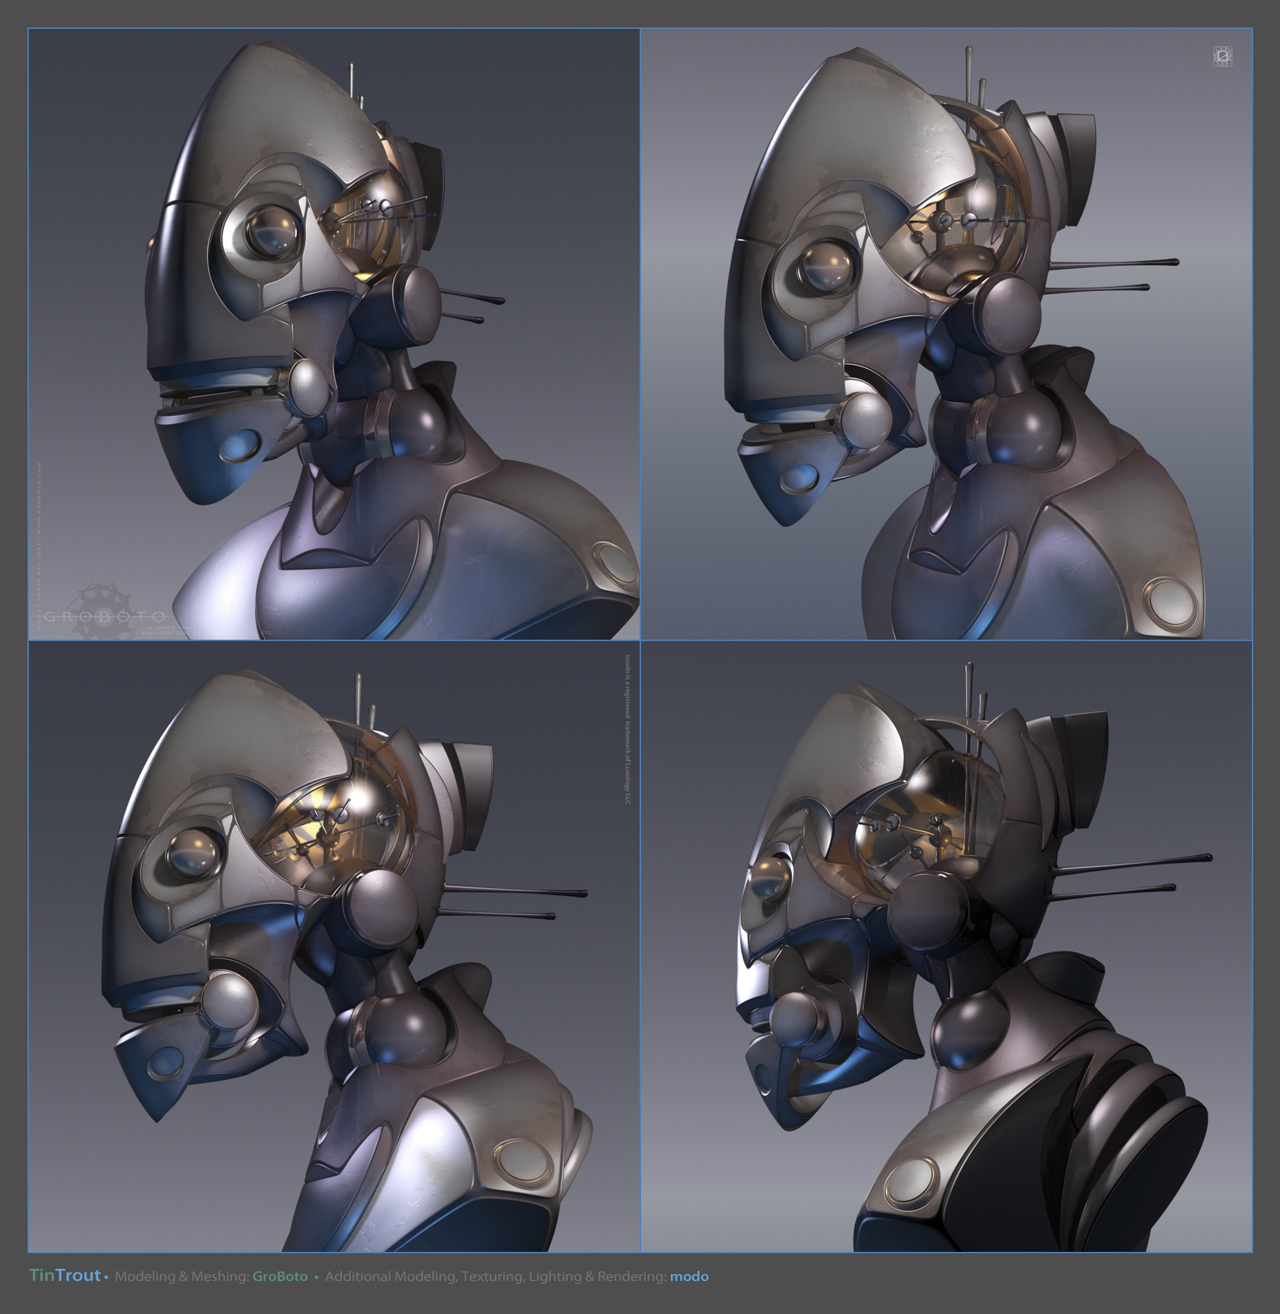 Groboto tintrout quadview 1 f6fdb606 exy1